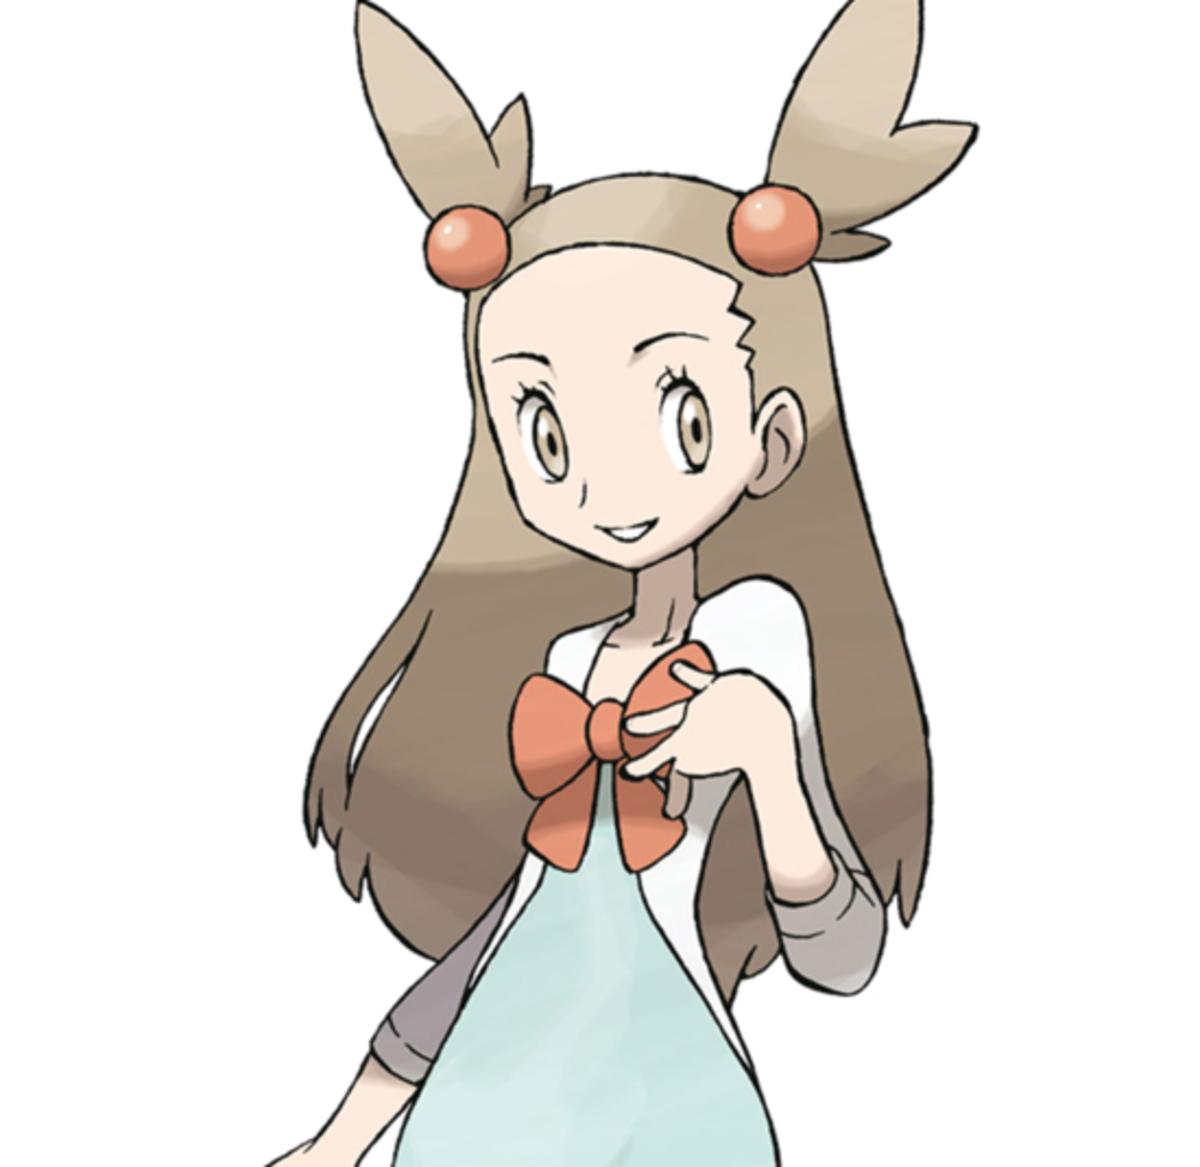 Jasmine (games)